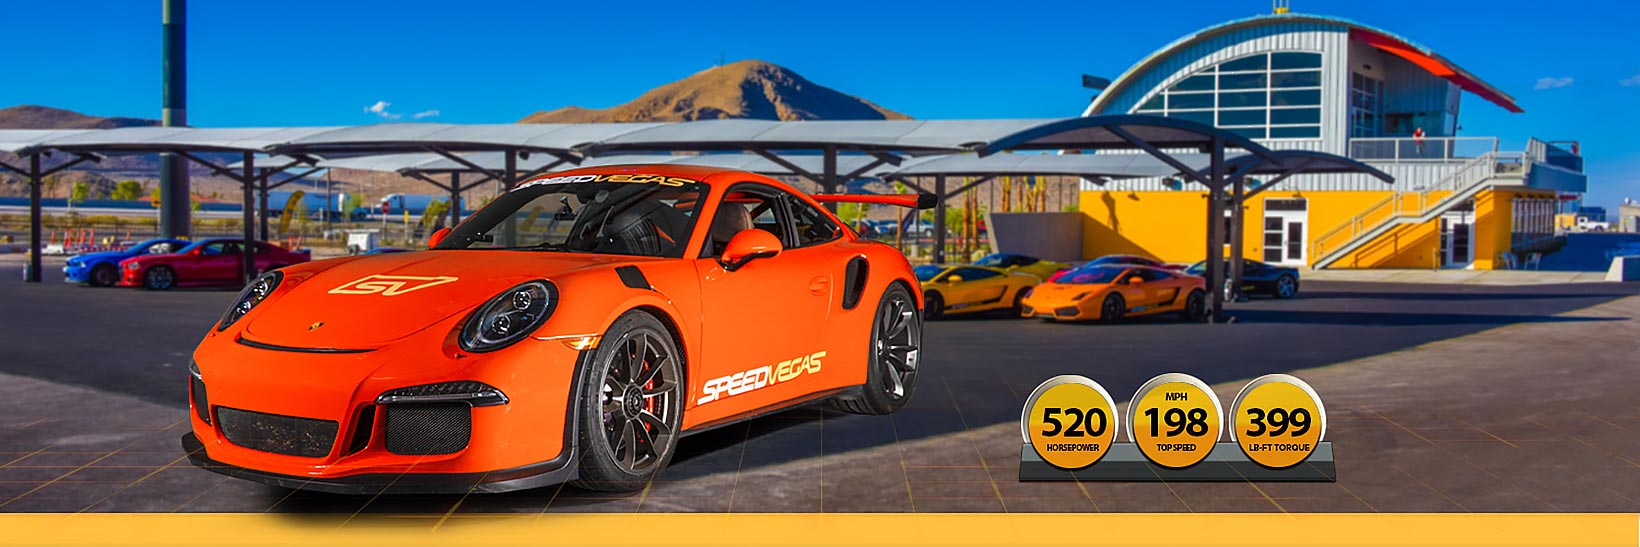 Porsche 911 GT3 RS Experience in Las Vegas